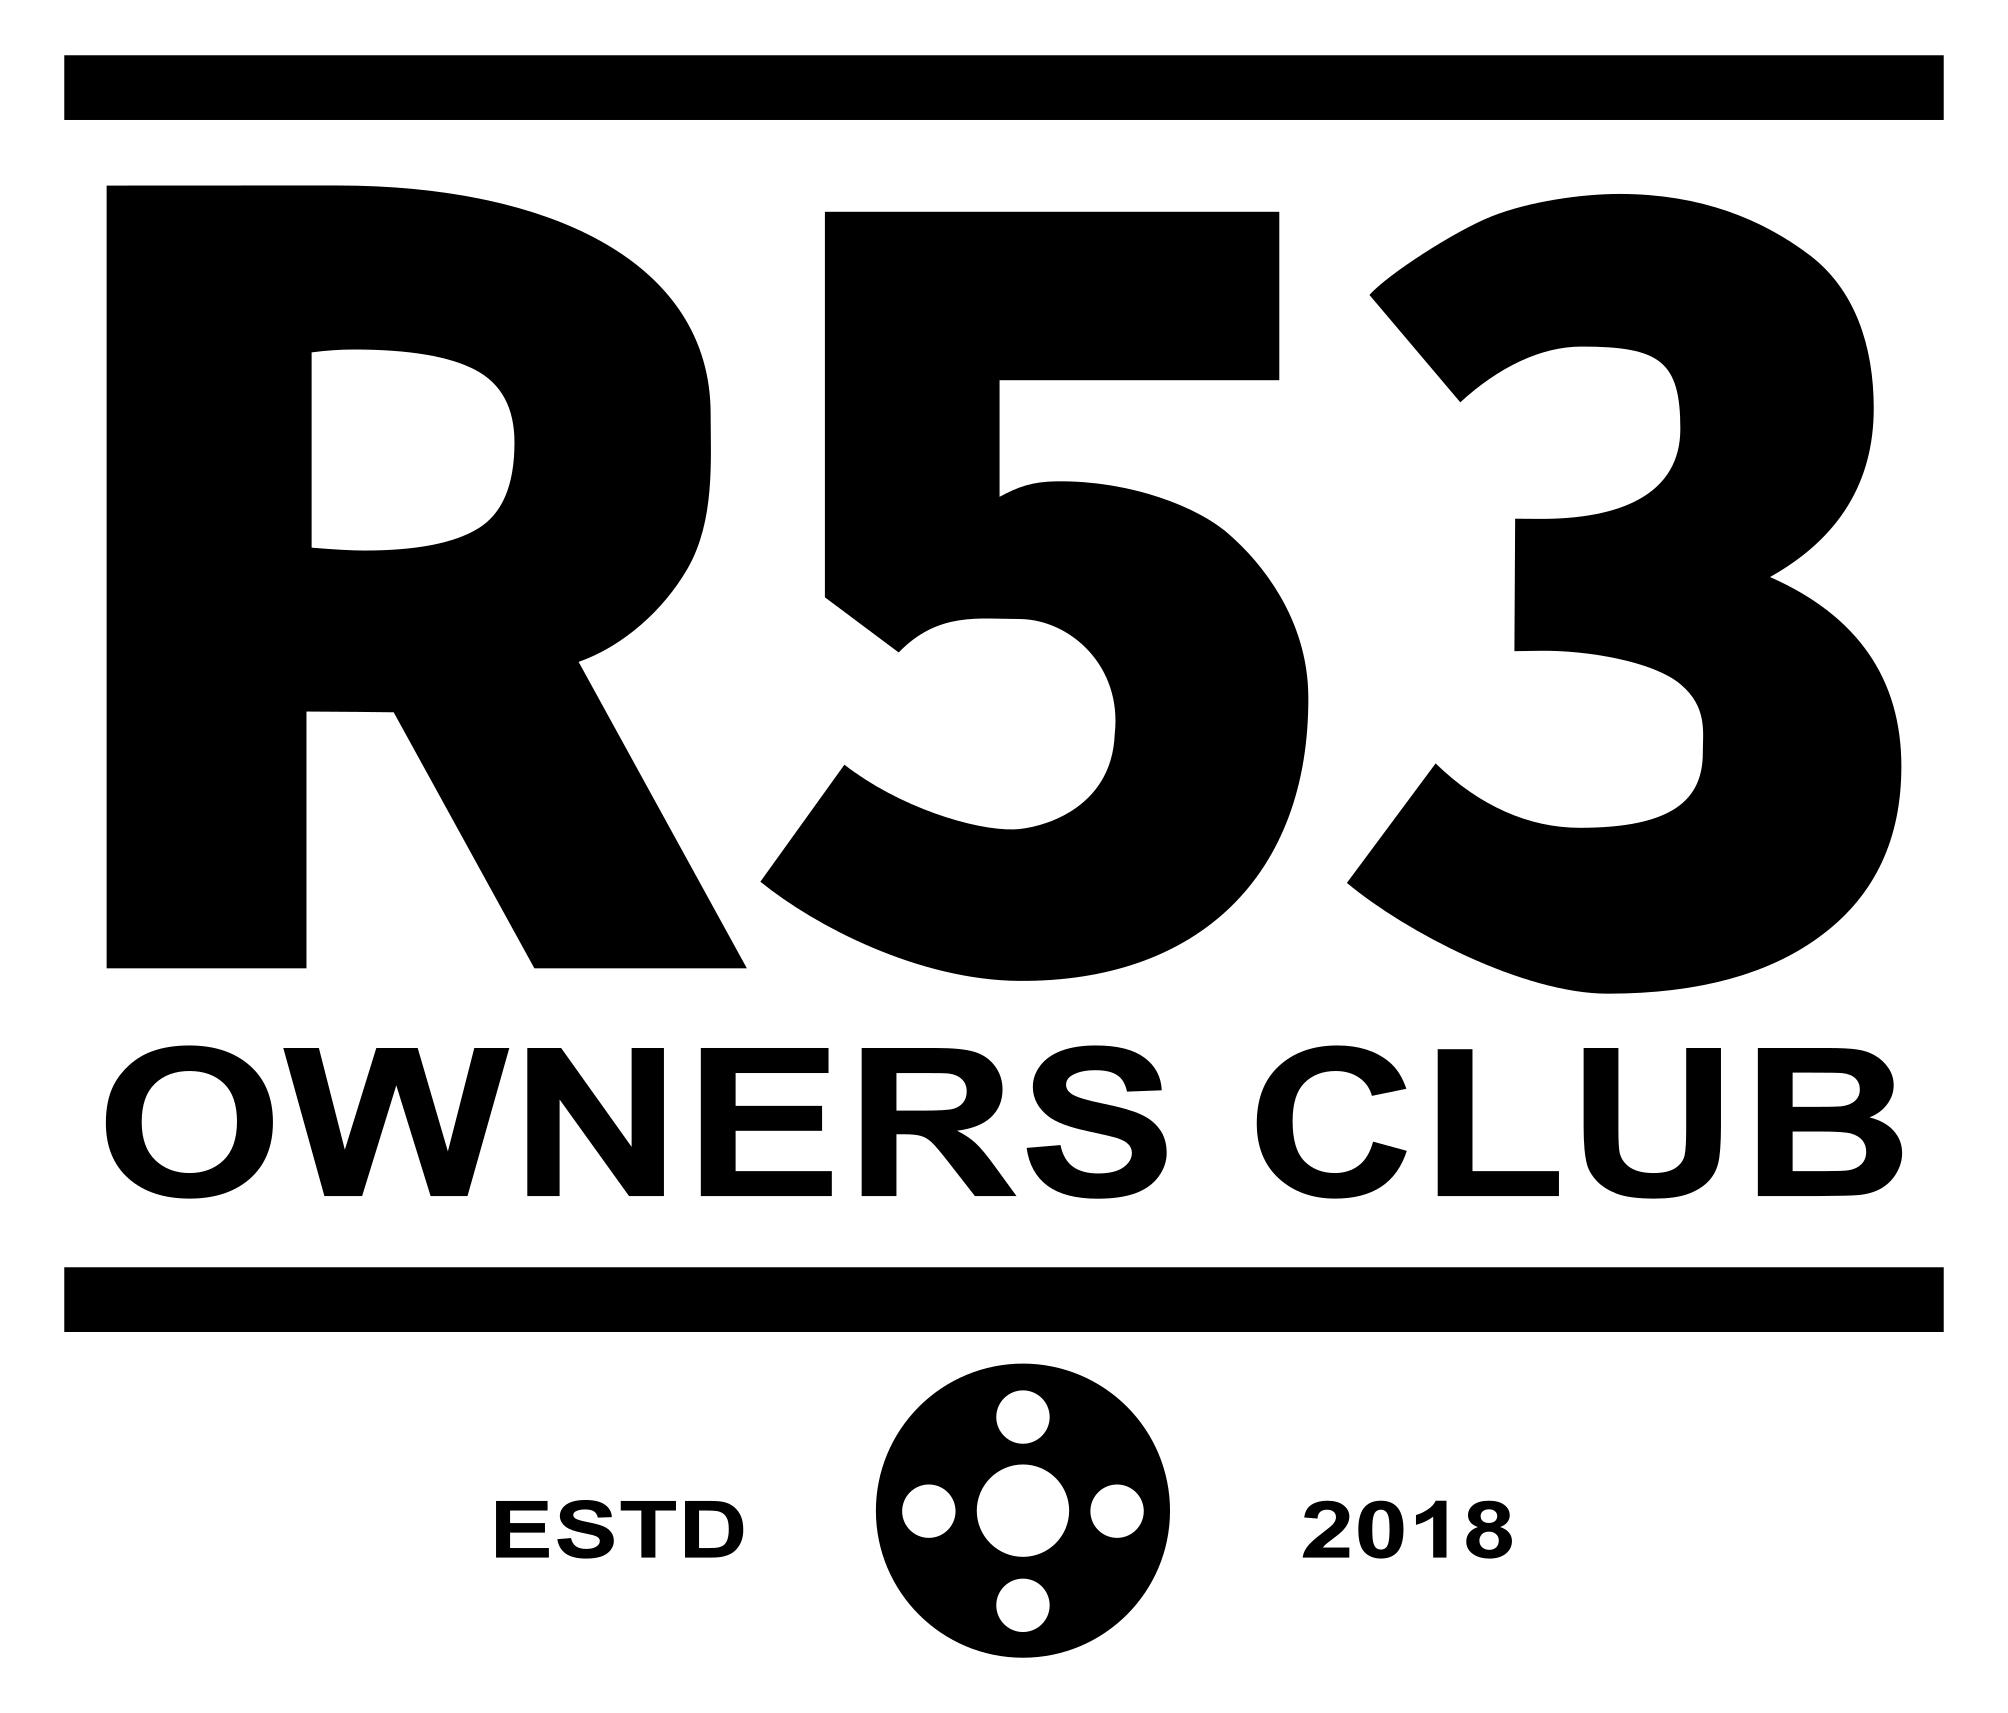 R53 Owners Club